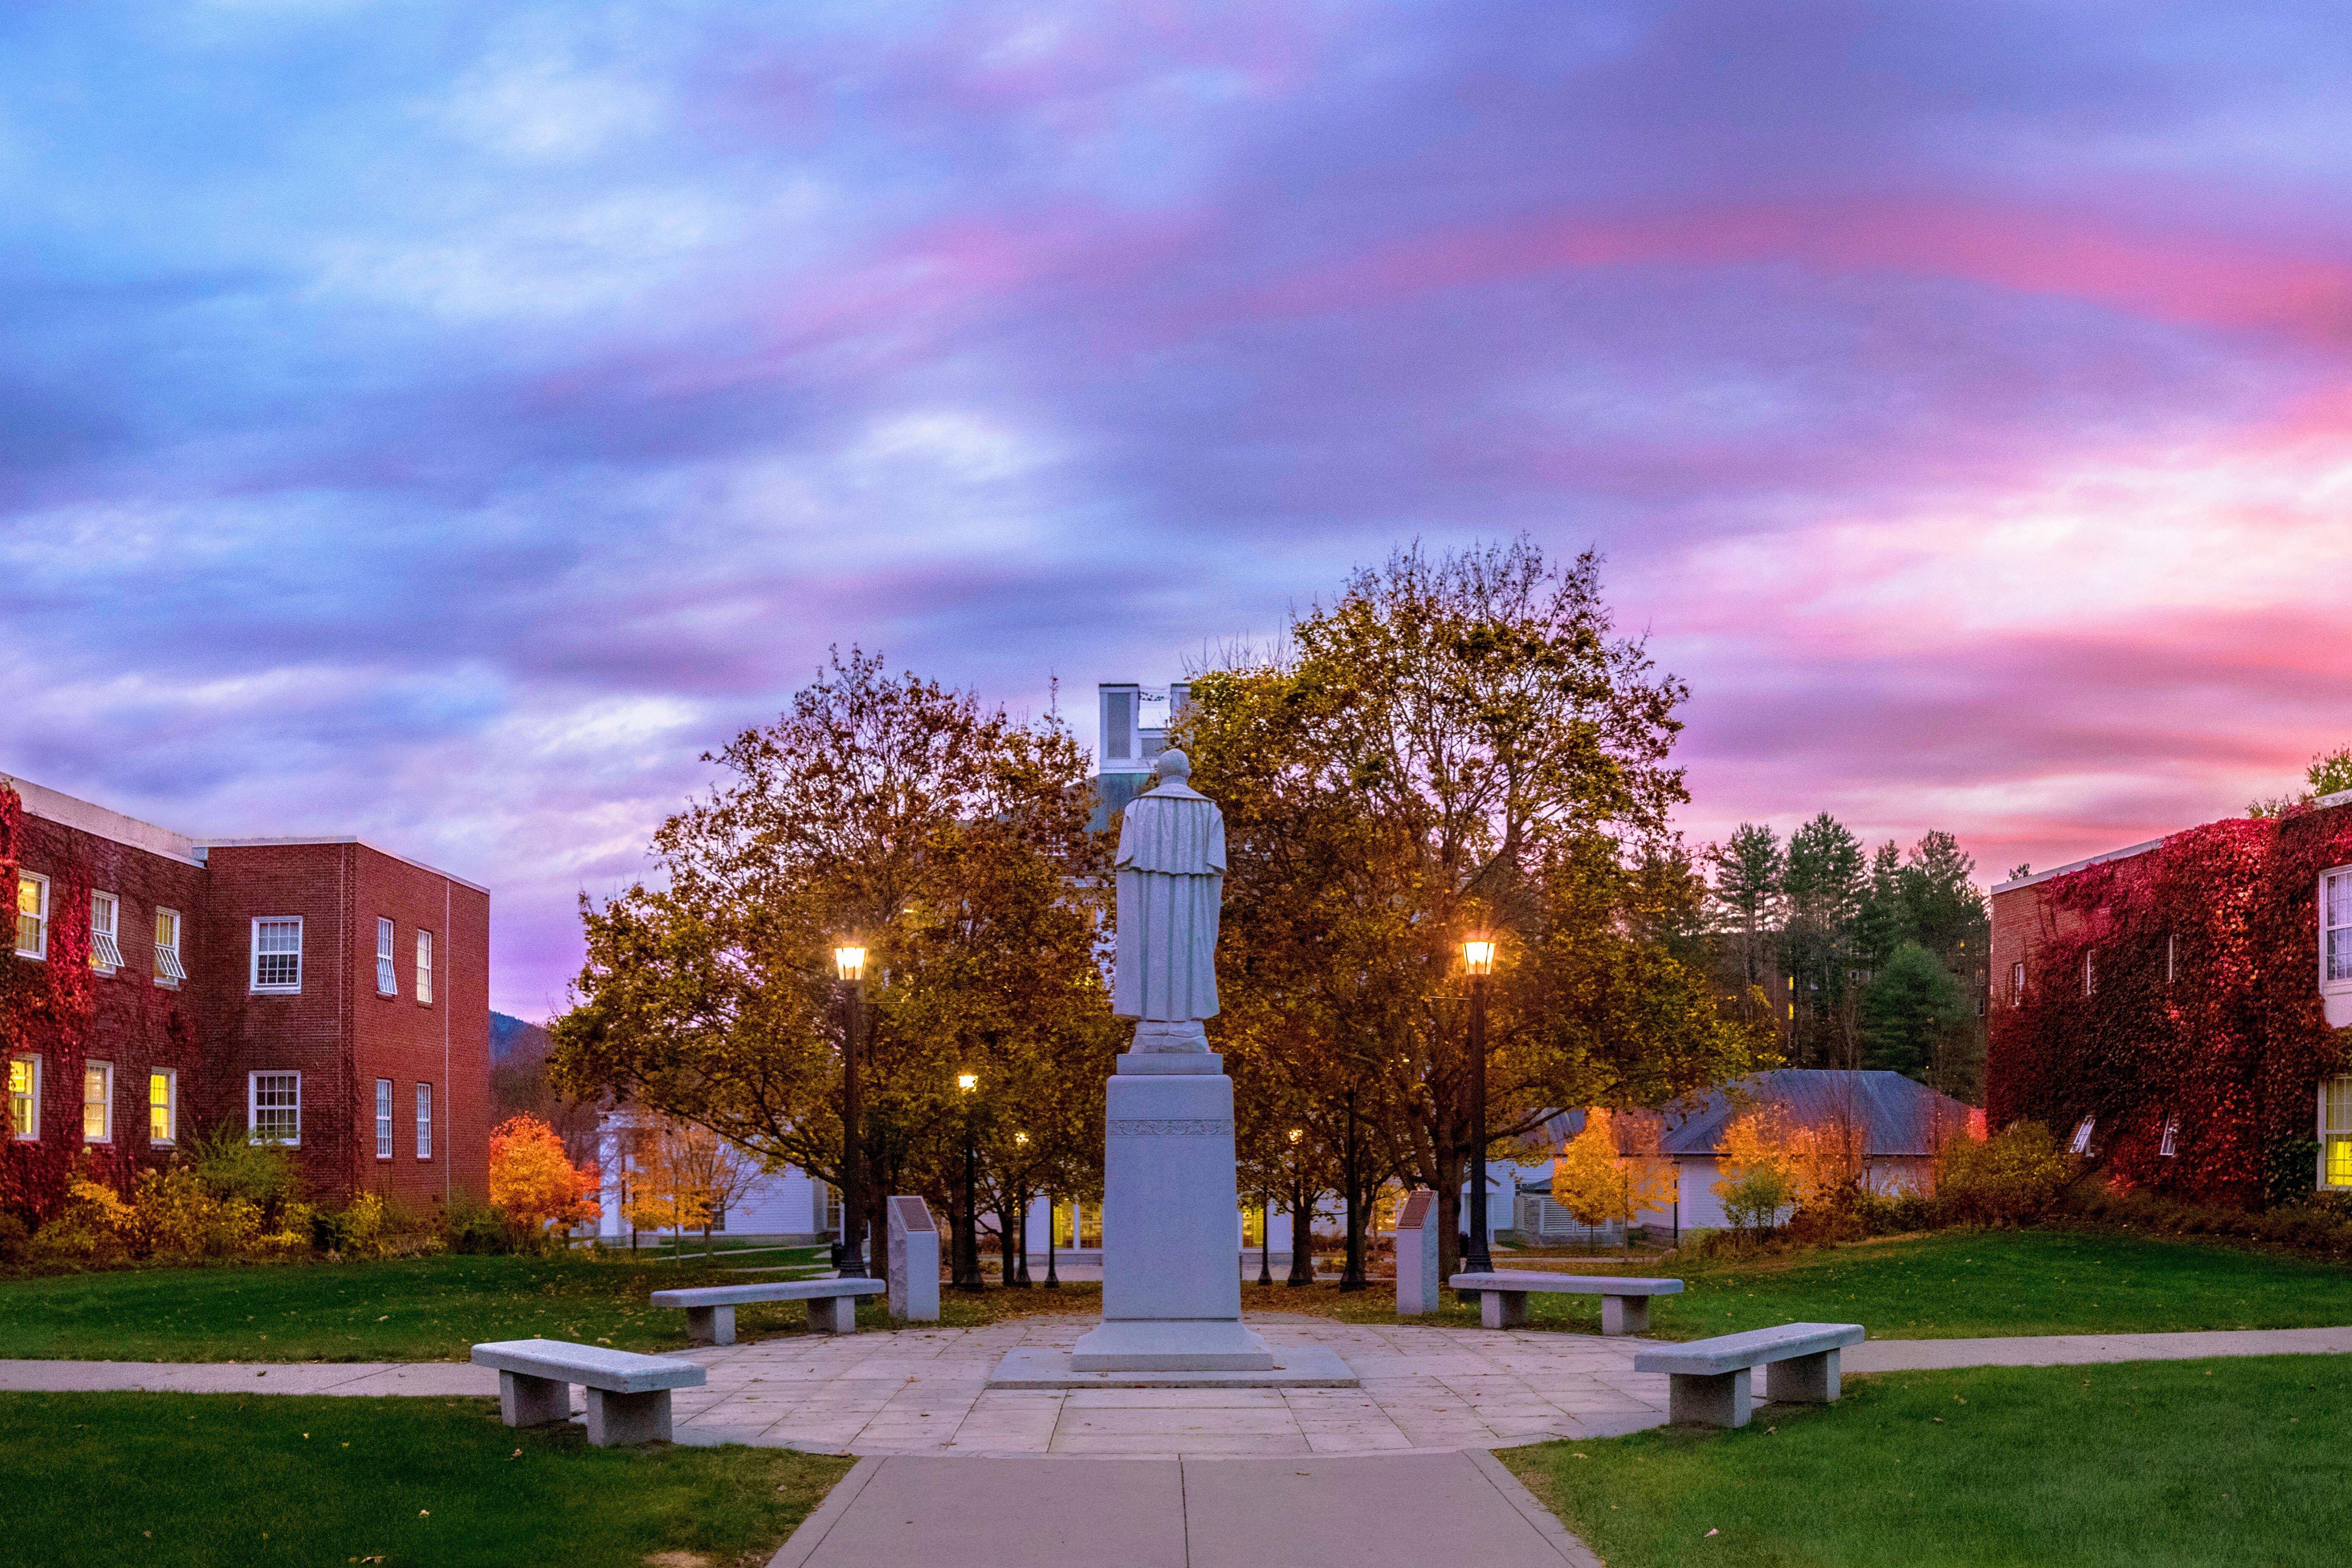 partridge statue - norwich campus - sunset